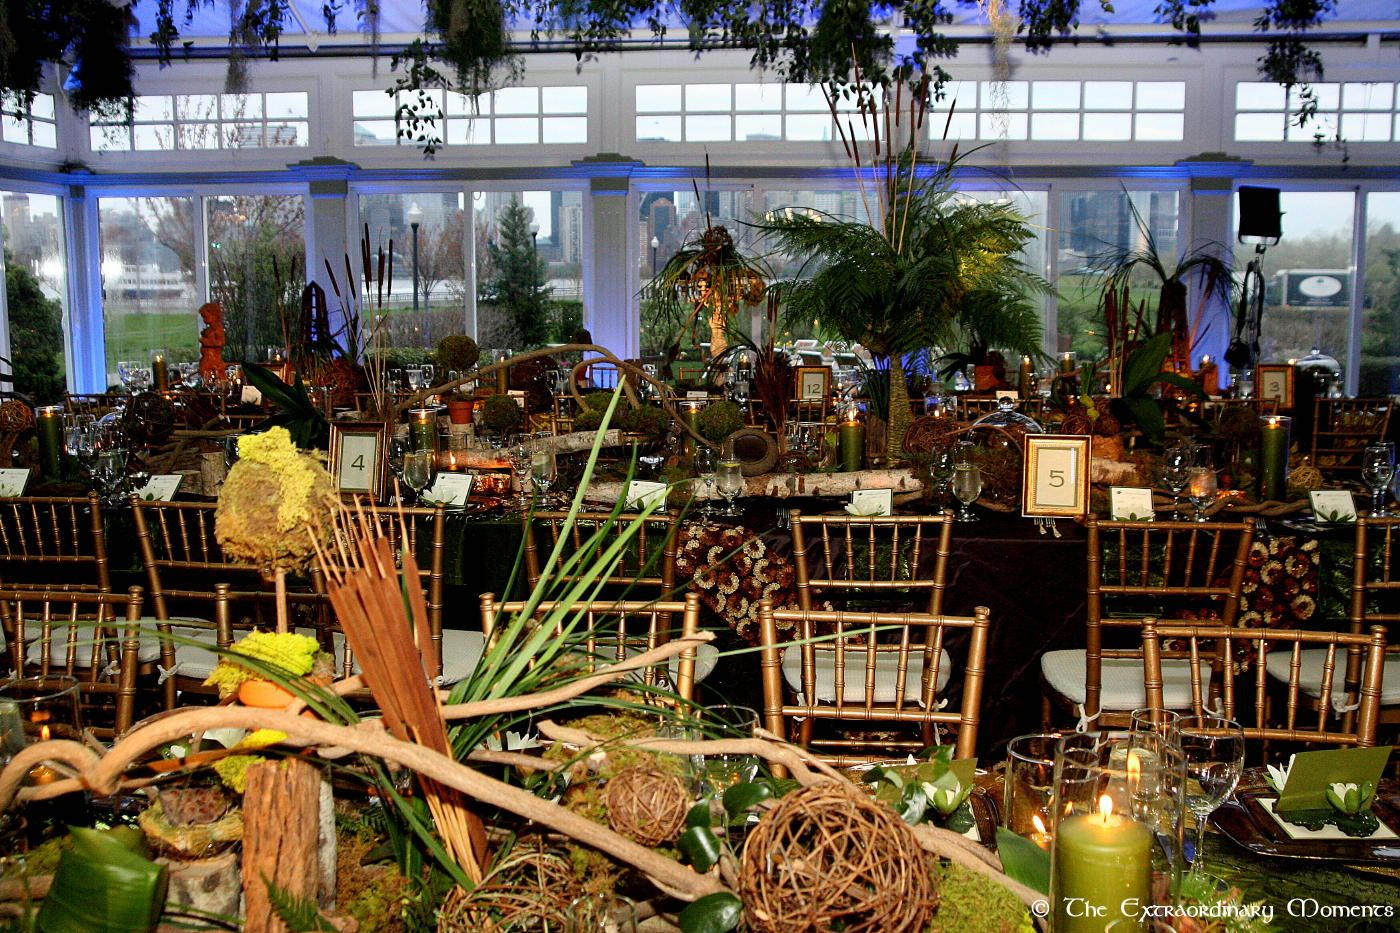 The Extraordinary Moments My Fair Wedding With David Tutera Swamp Bride